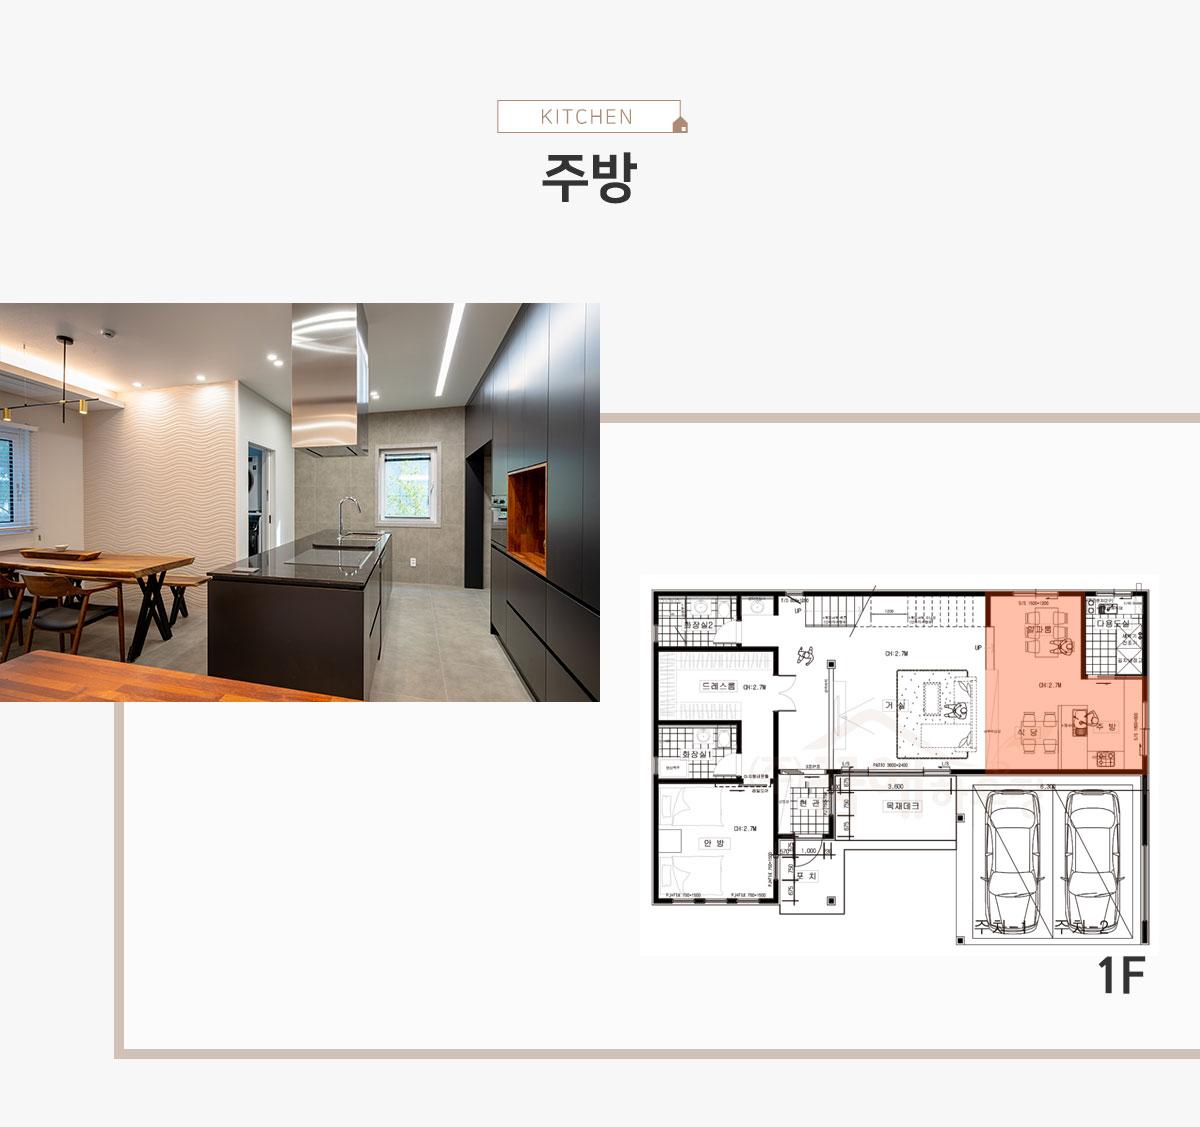 004_kitchen_인천청라_-유00_01.jpg